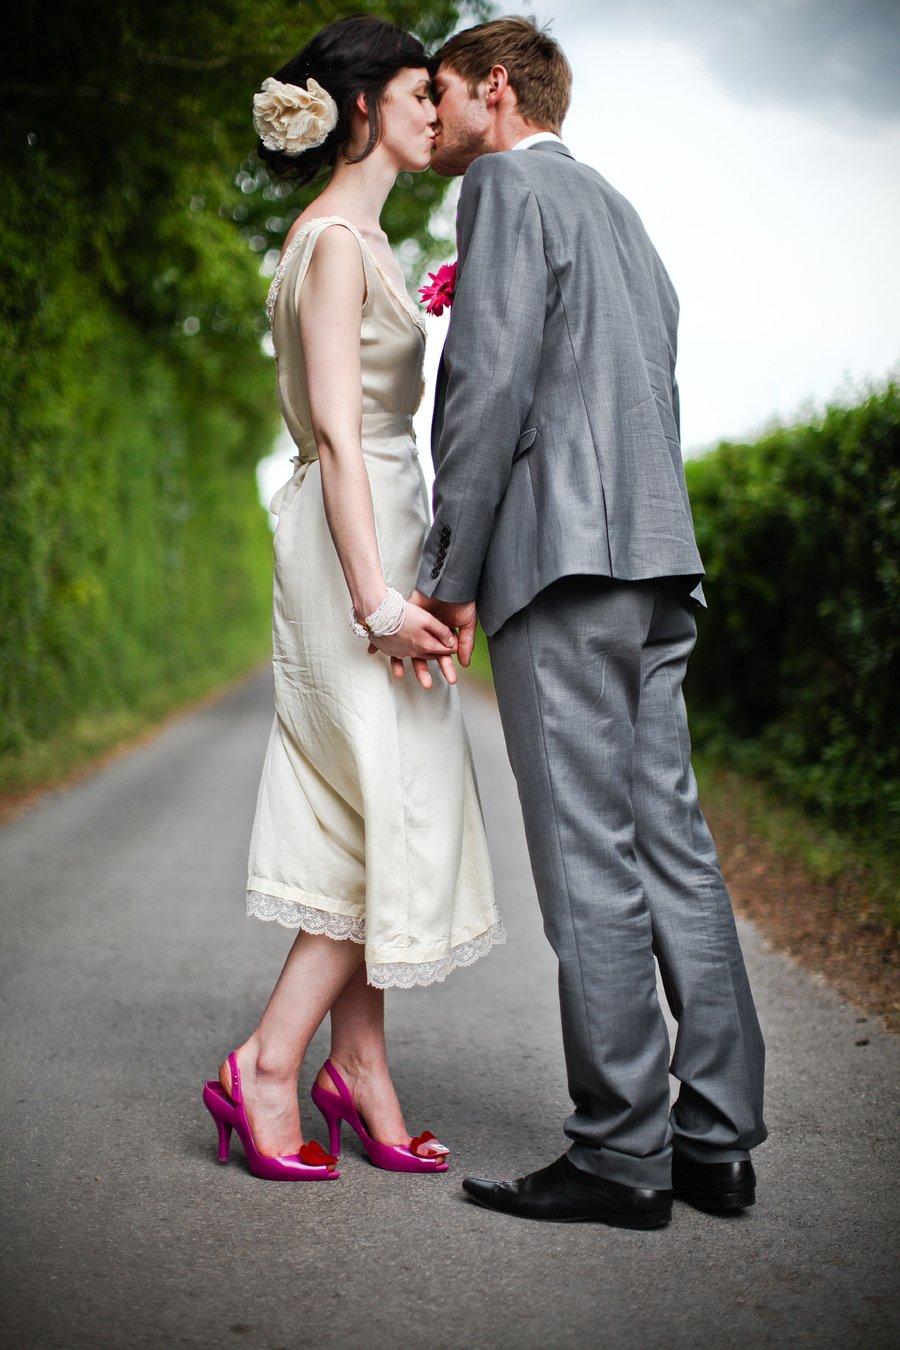 Berkshire-Wedding-Photography-Fazackarley-Aisling-and-Philip-28